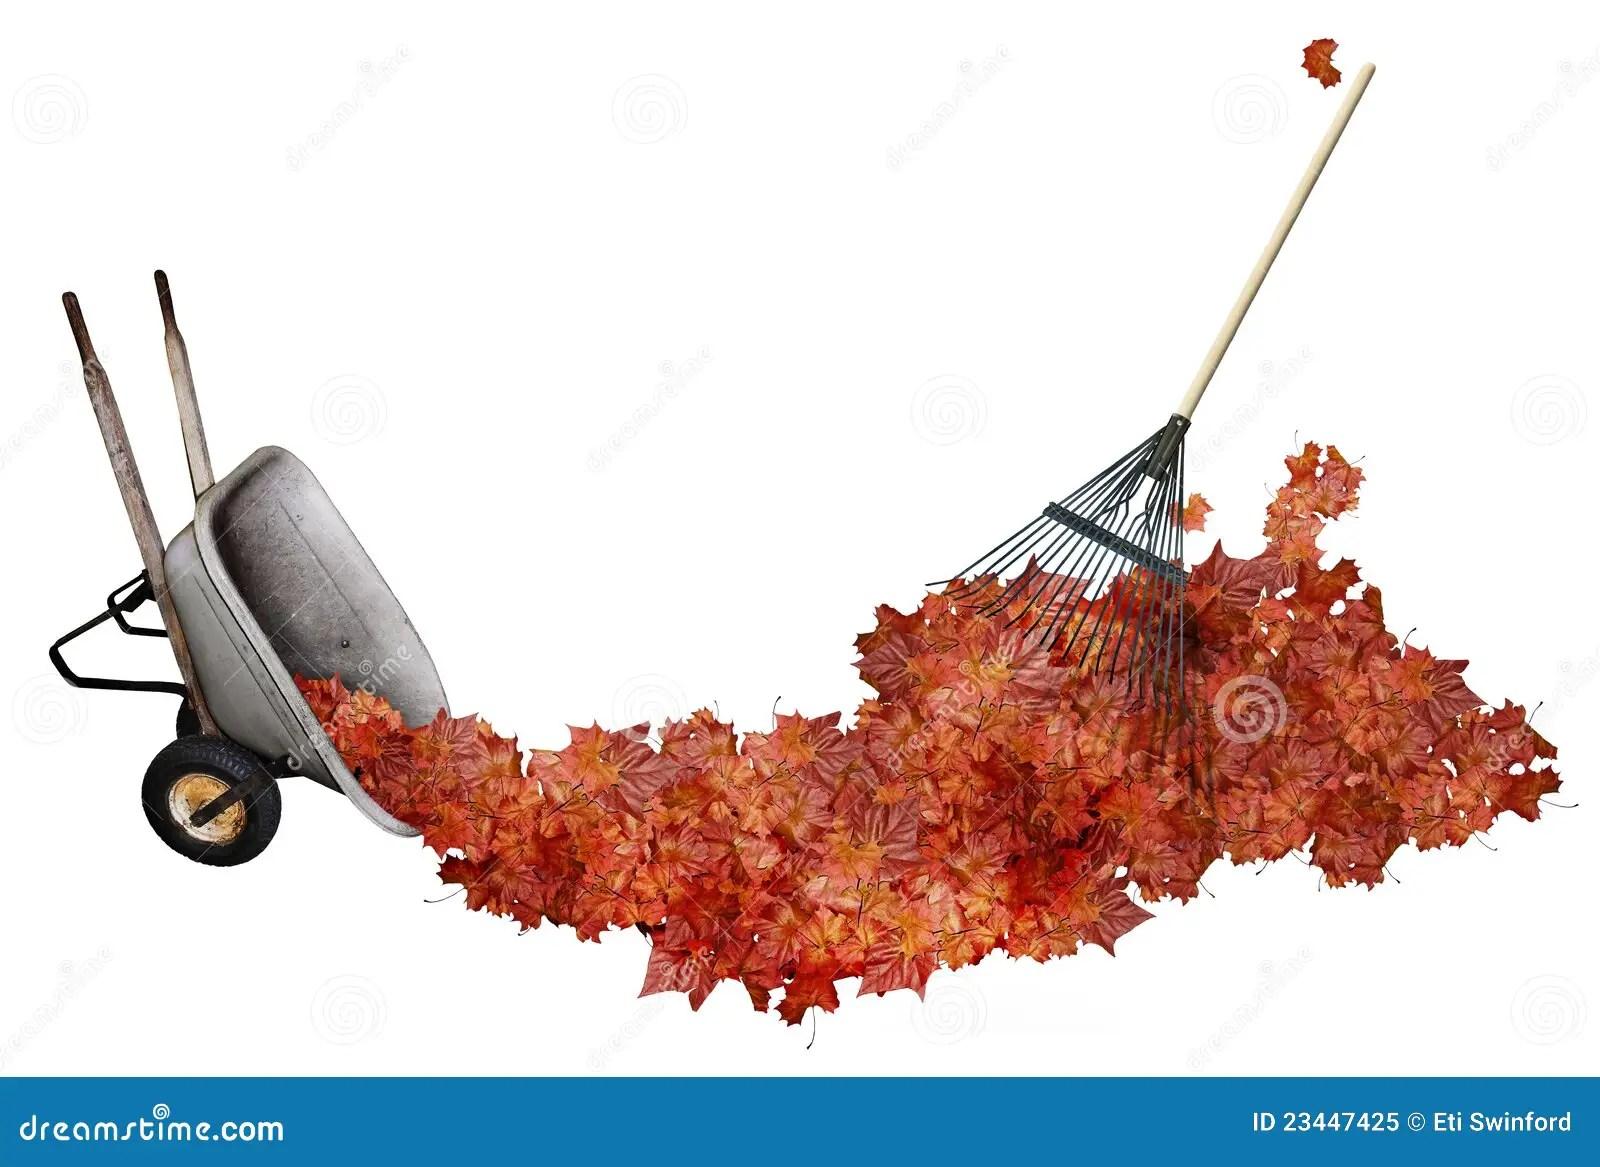 hight resolution of raking leaves